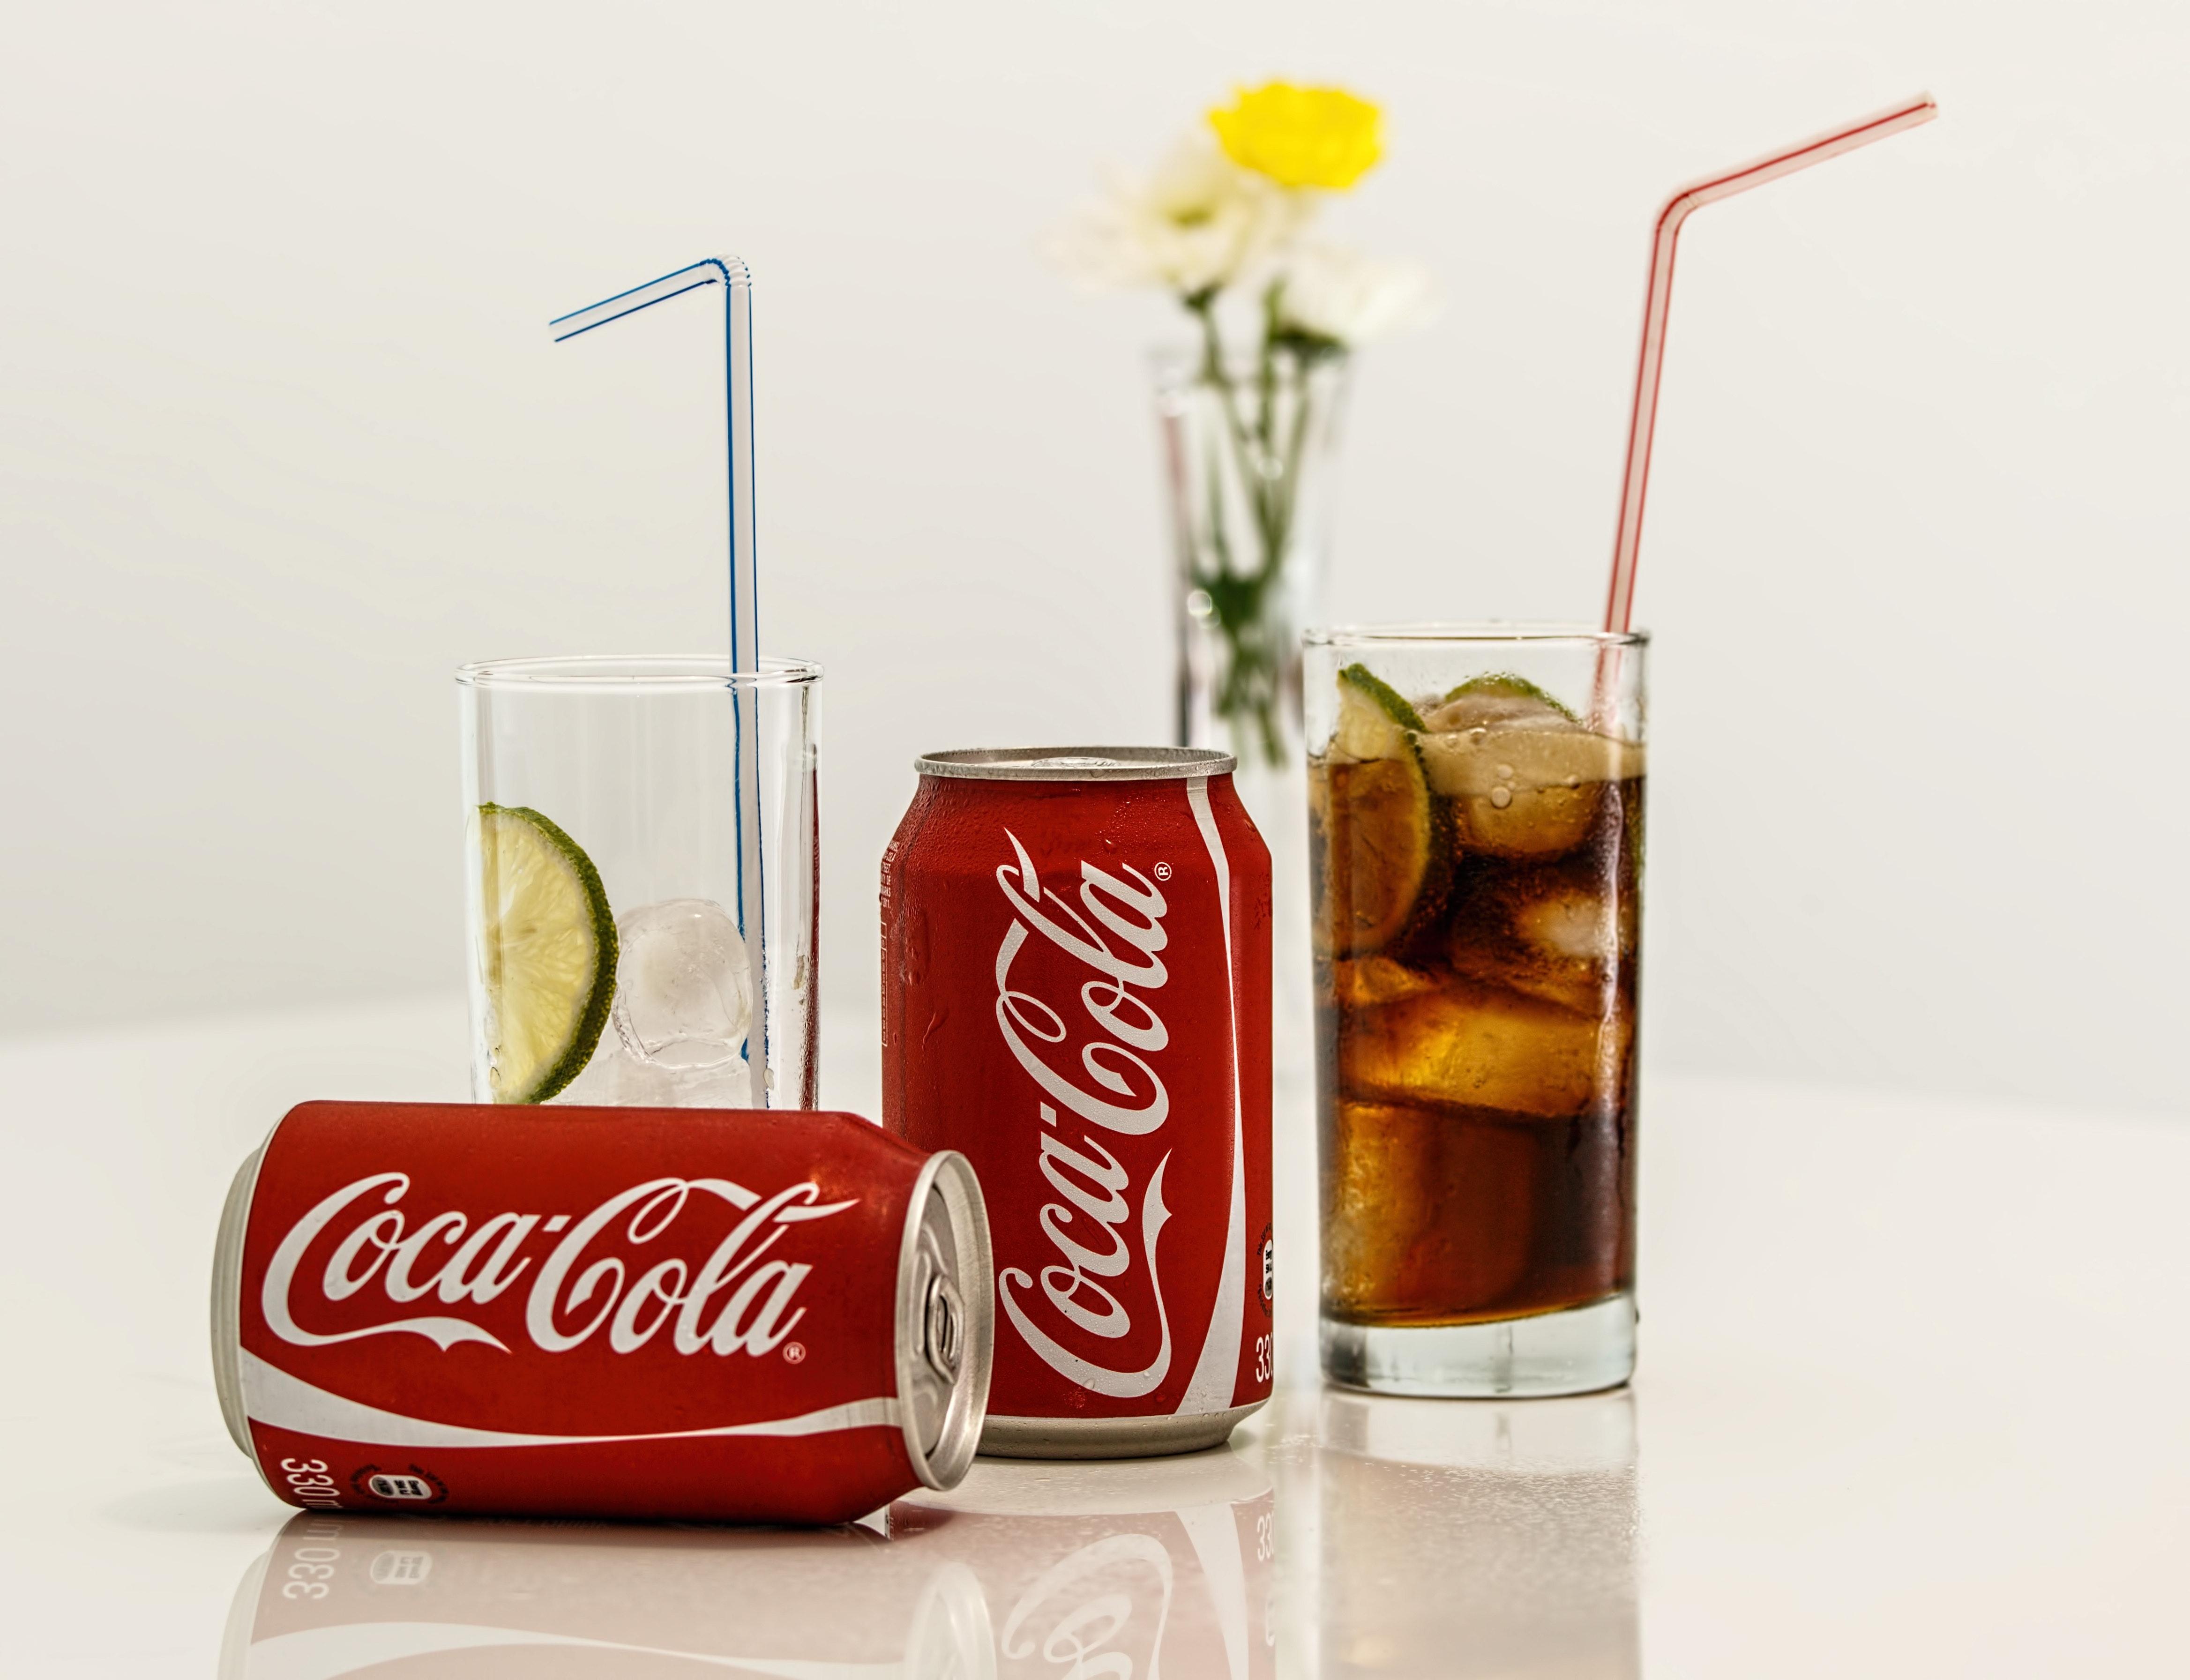 Kostenloses Foto zum Thema: alkoholfreie getränke, coca cola, eis